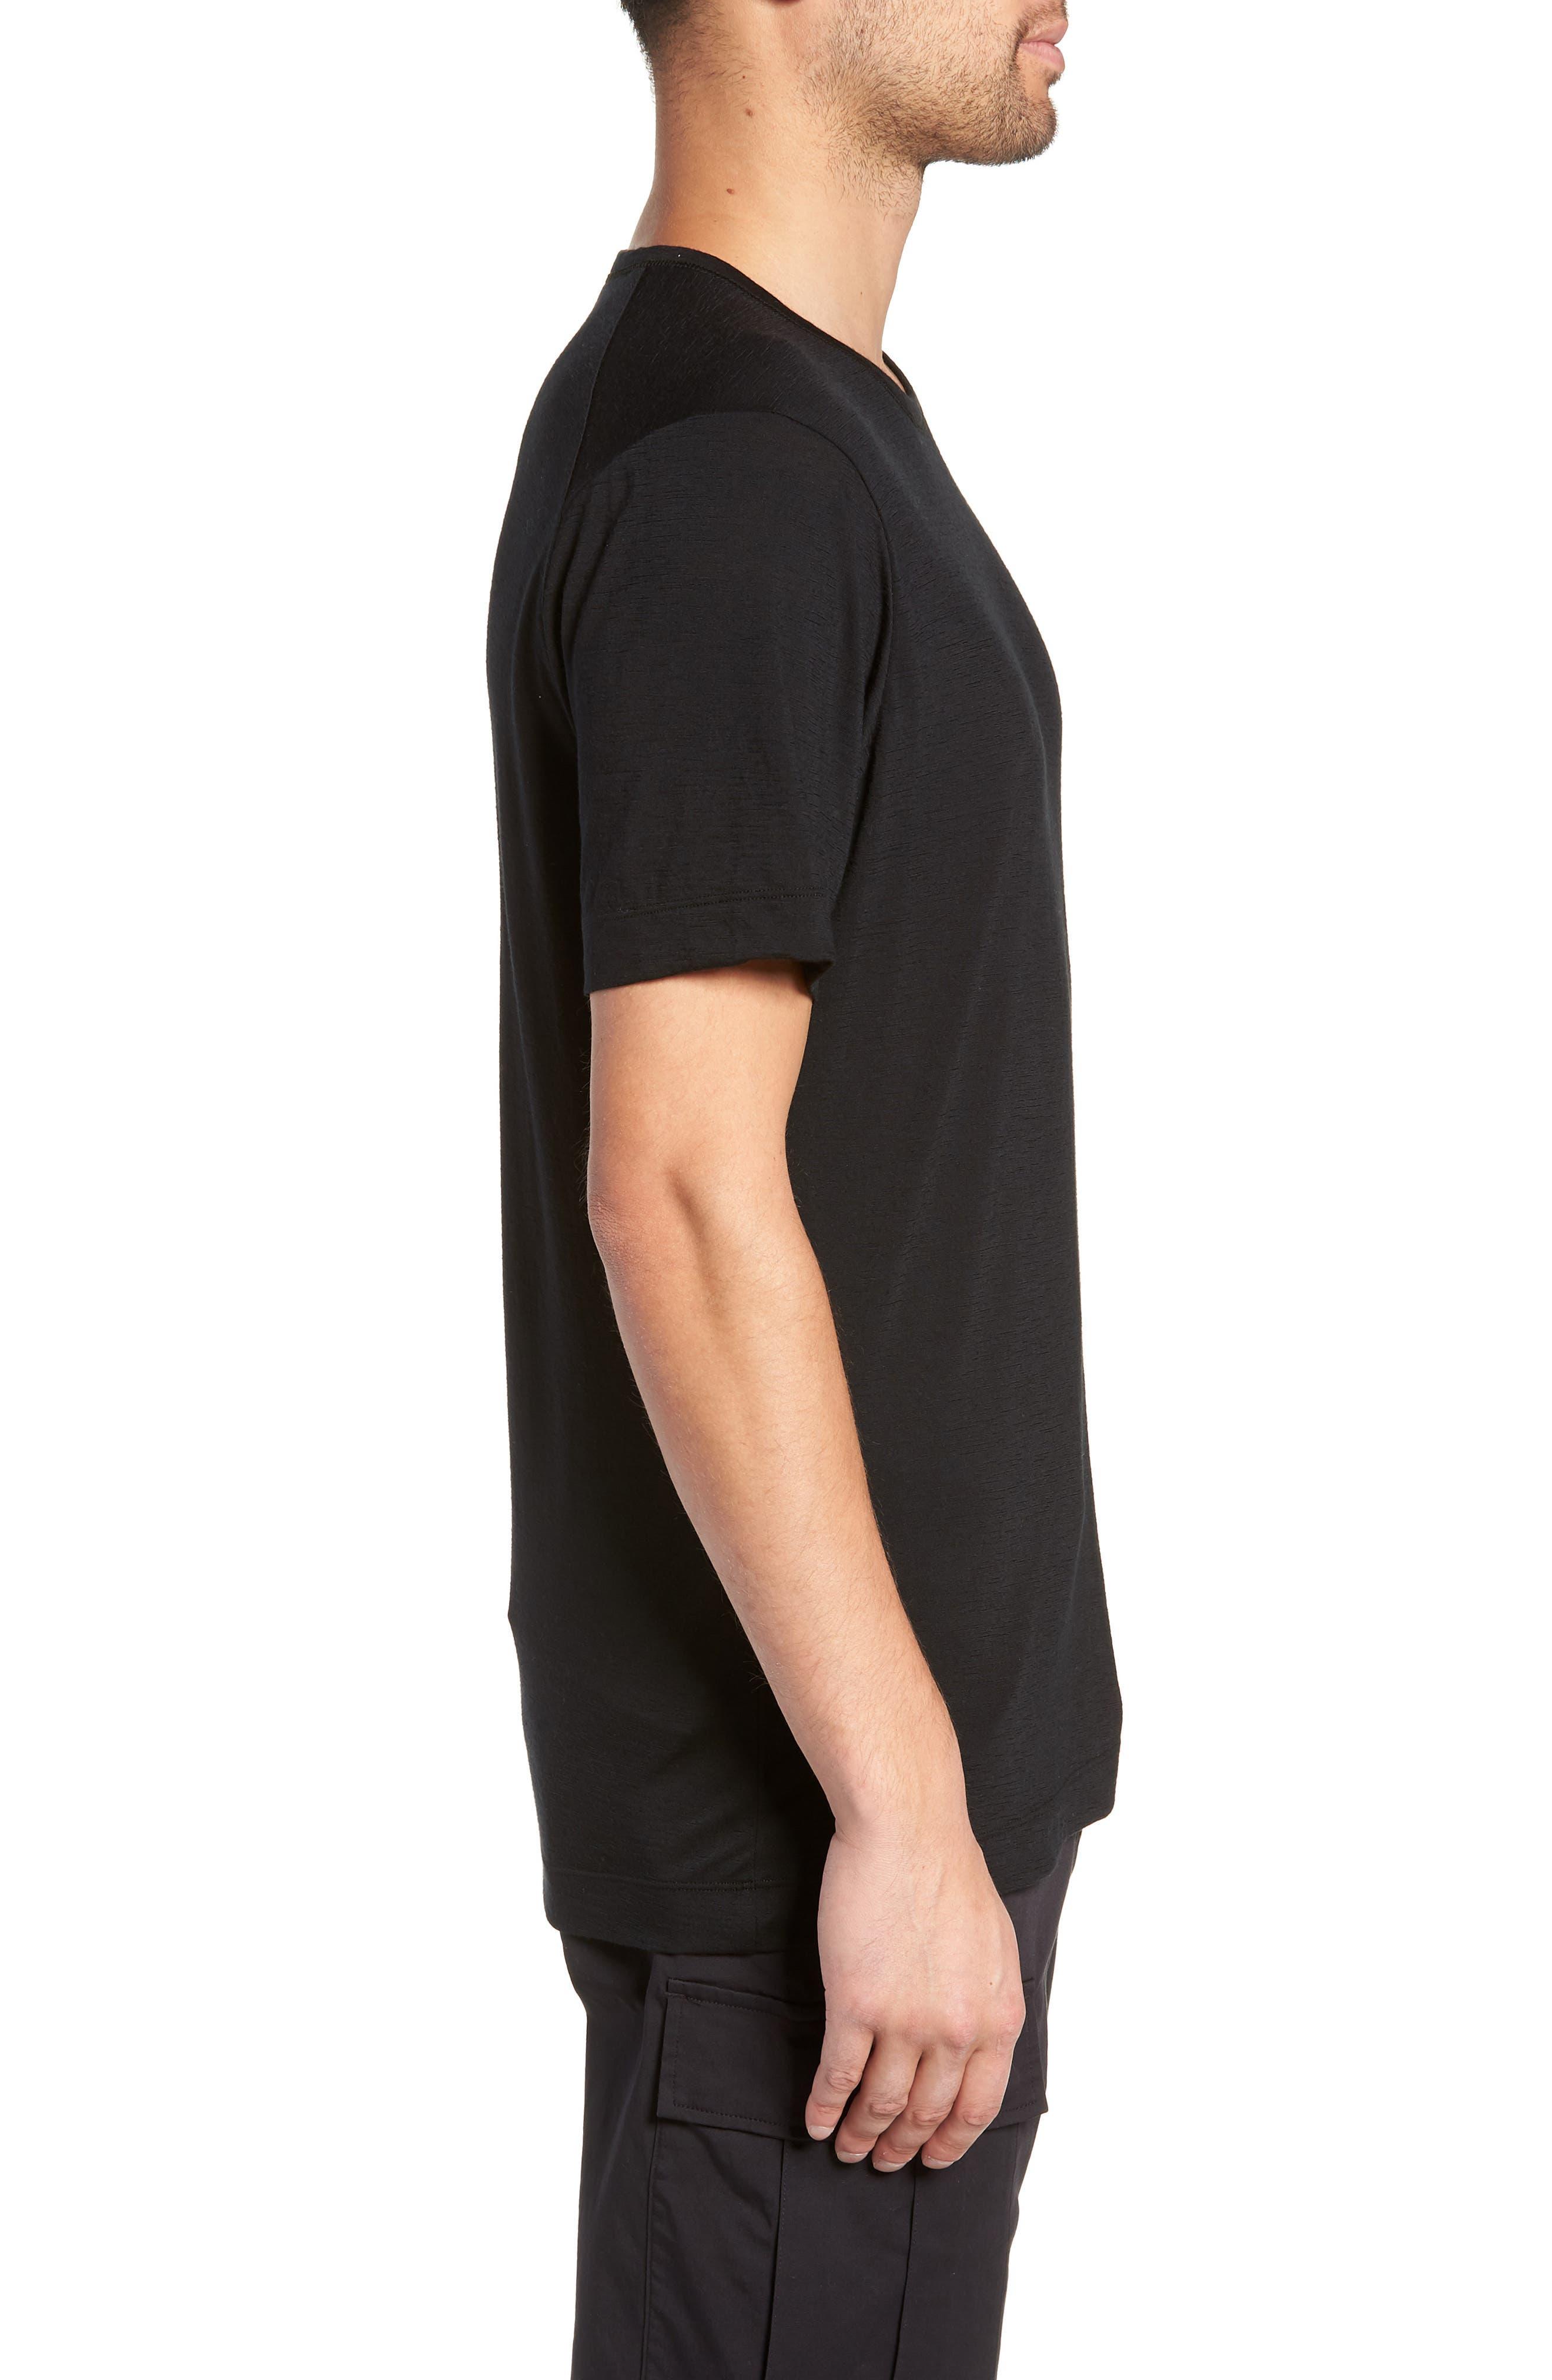 Swedish Merino Wool T-Shirt,                             Alternate thumbnail 3, color,                             BLACK